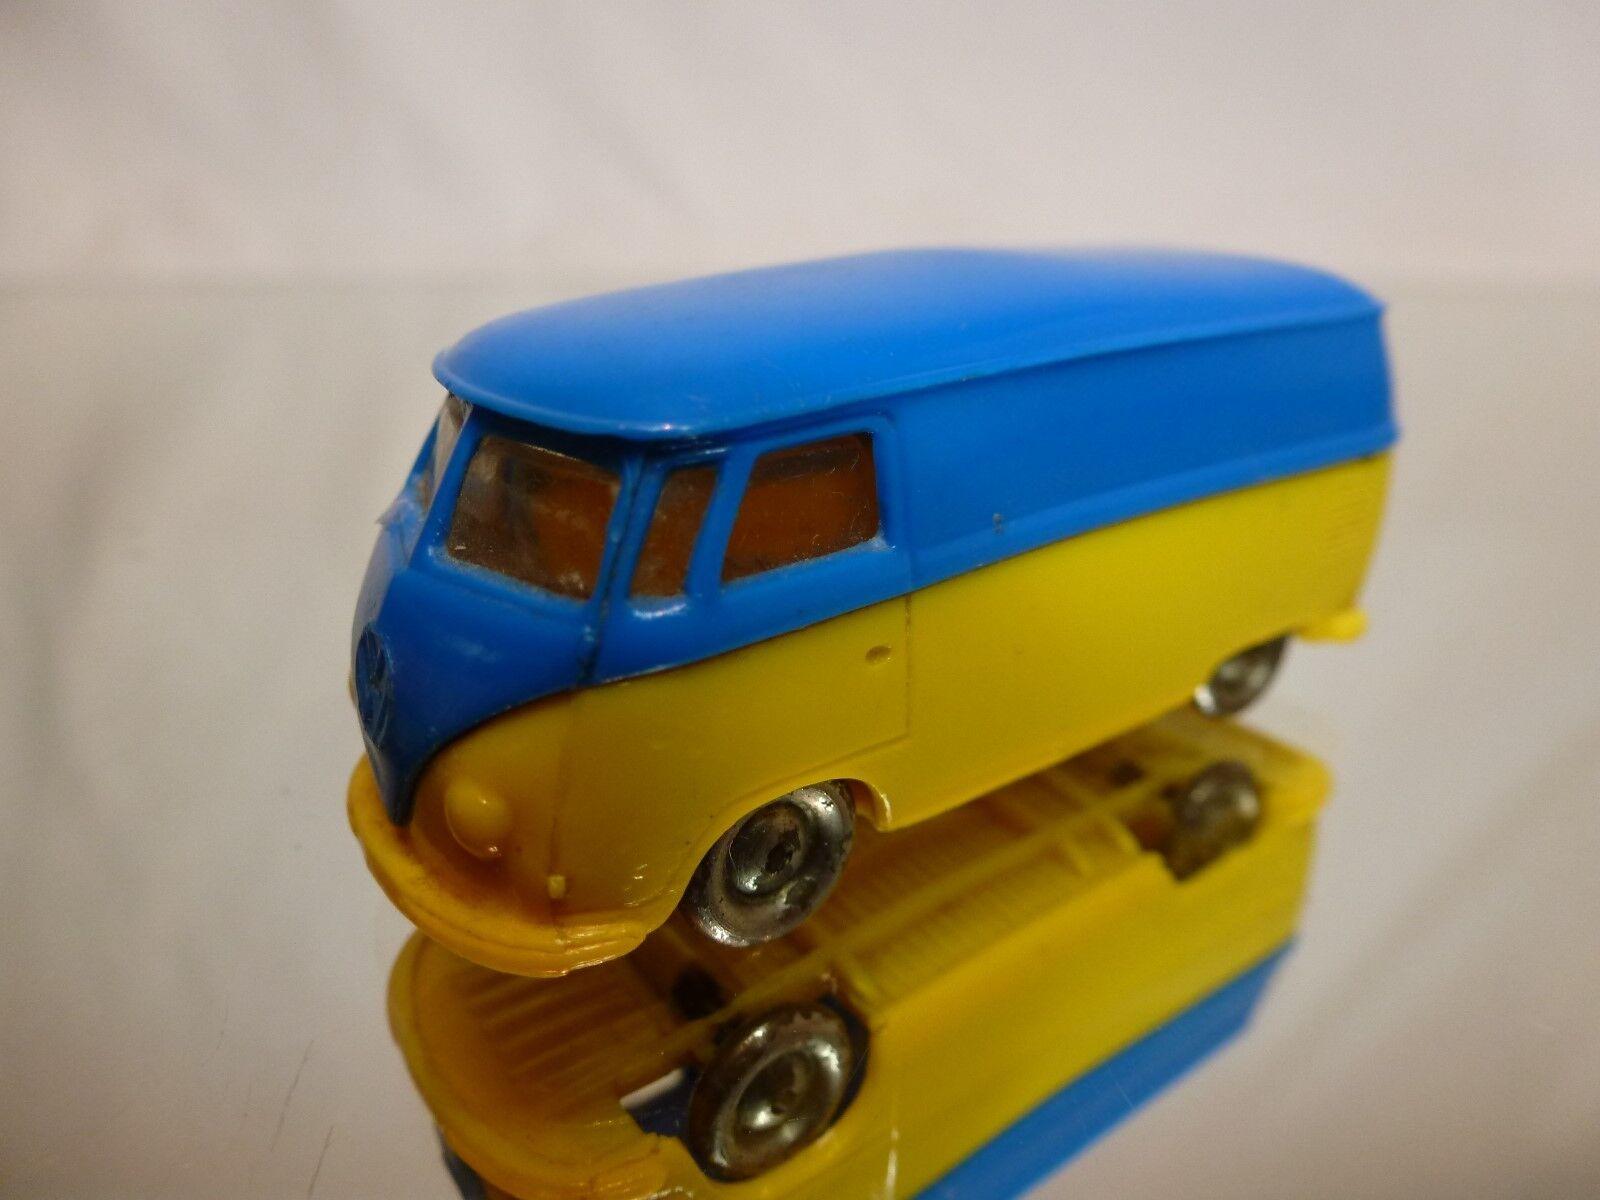 marca LEGO DENMARK - VINTAGE VOLKSWAGEN  T1 T1 T1 autobus 1 87 blu gituttio  - GOOD CONDITION  compra nuovo economico